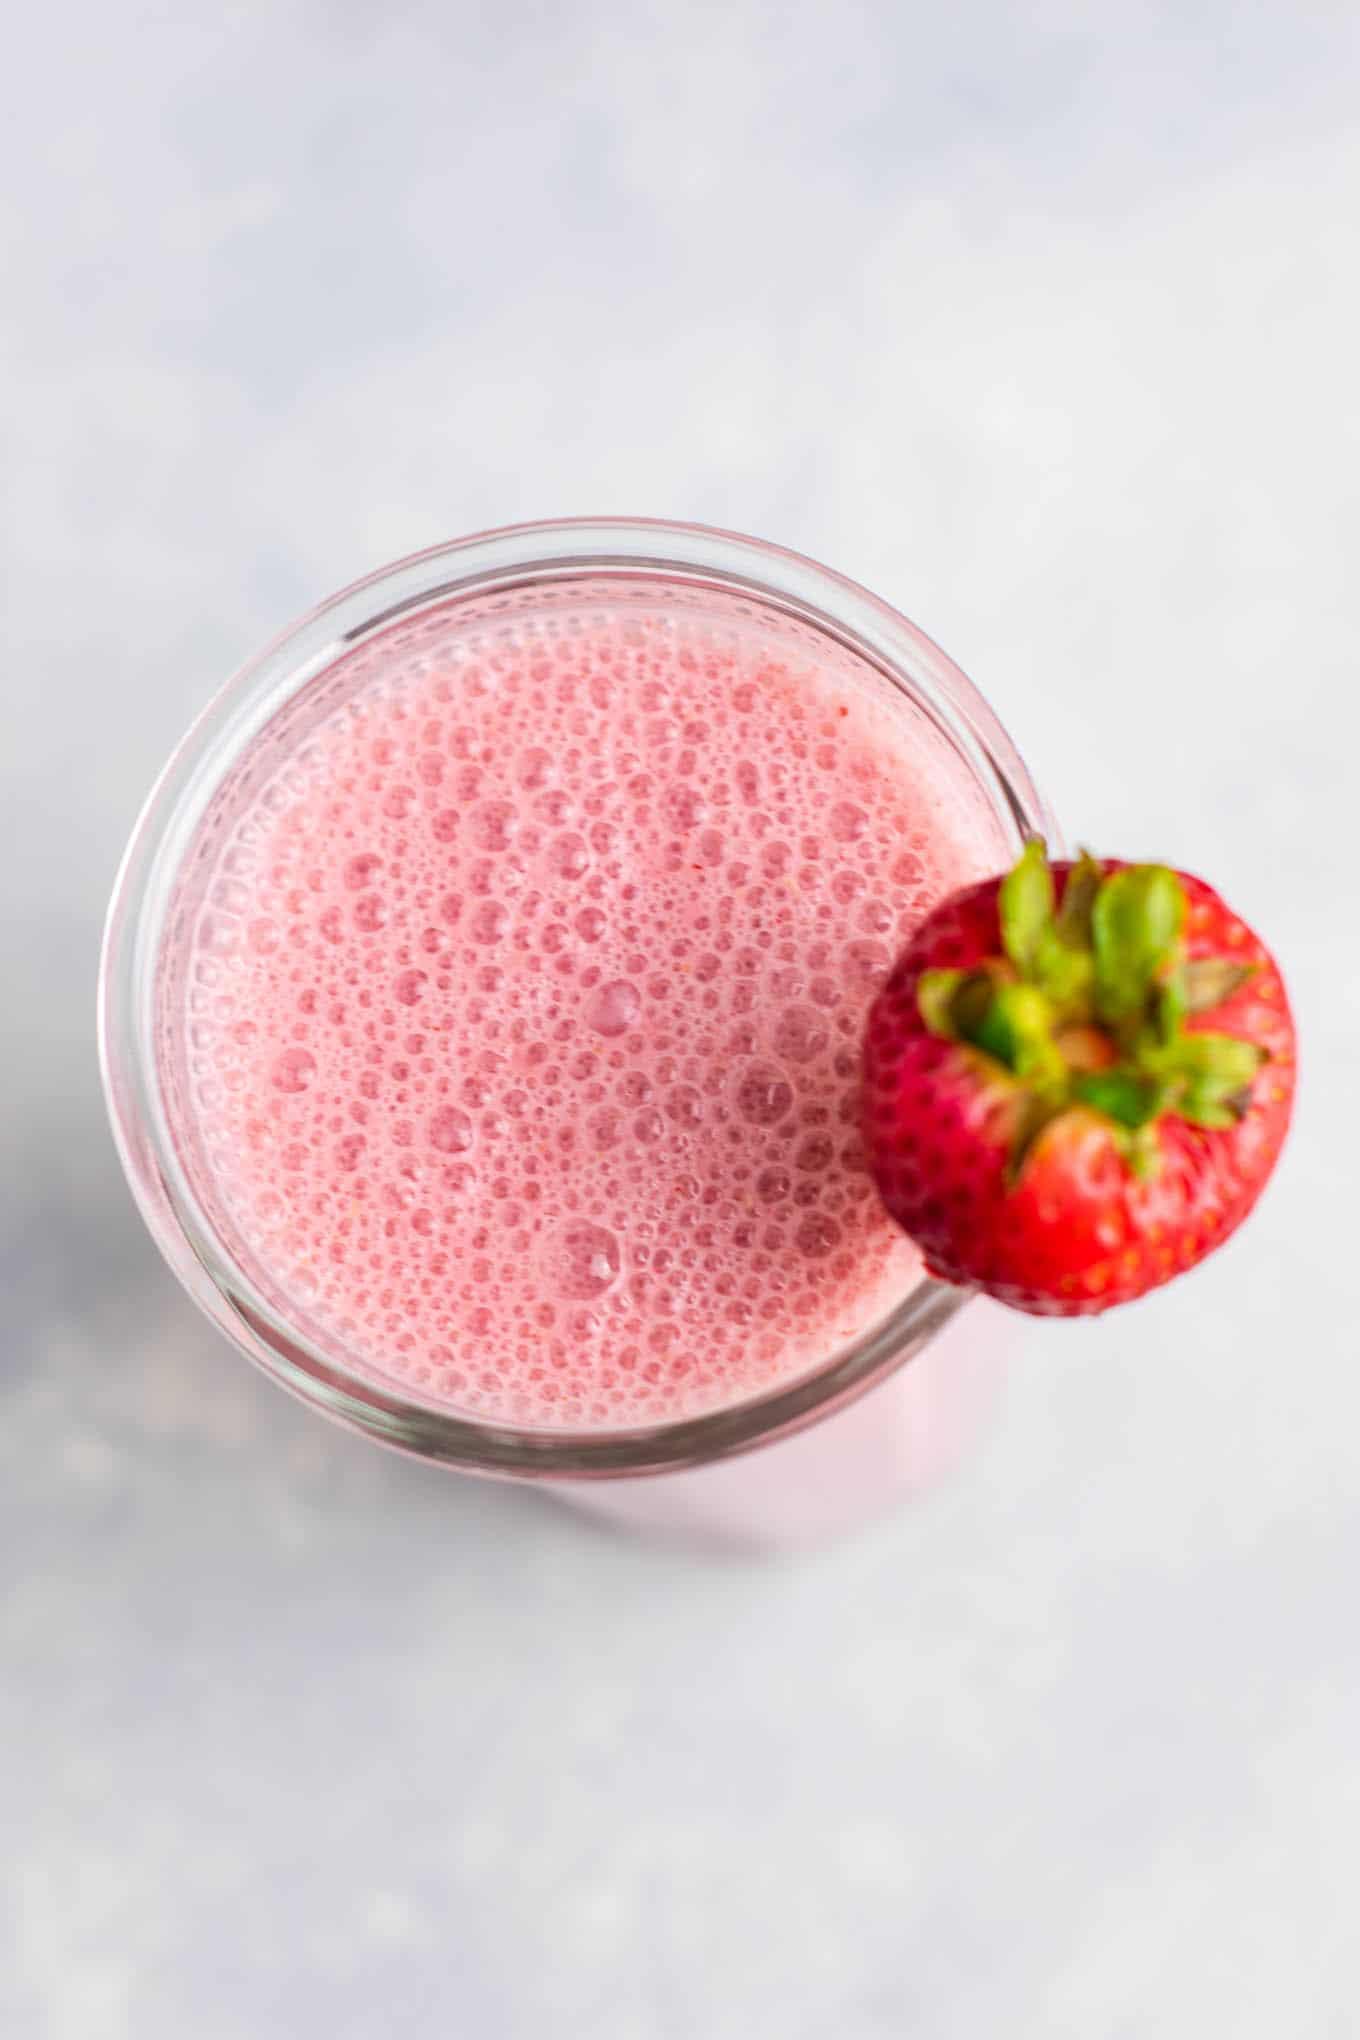 Strawberry smoothie recipe with fresh strawberries. Perfect for summer! #strawberrysmoothie #smoothie #vegetarian #breakfast #smoothierecipe #healthy #healthyfood #healthyrecipes #healthylifestyle